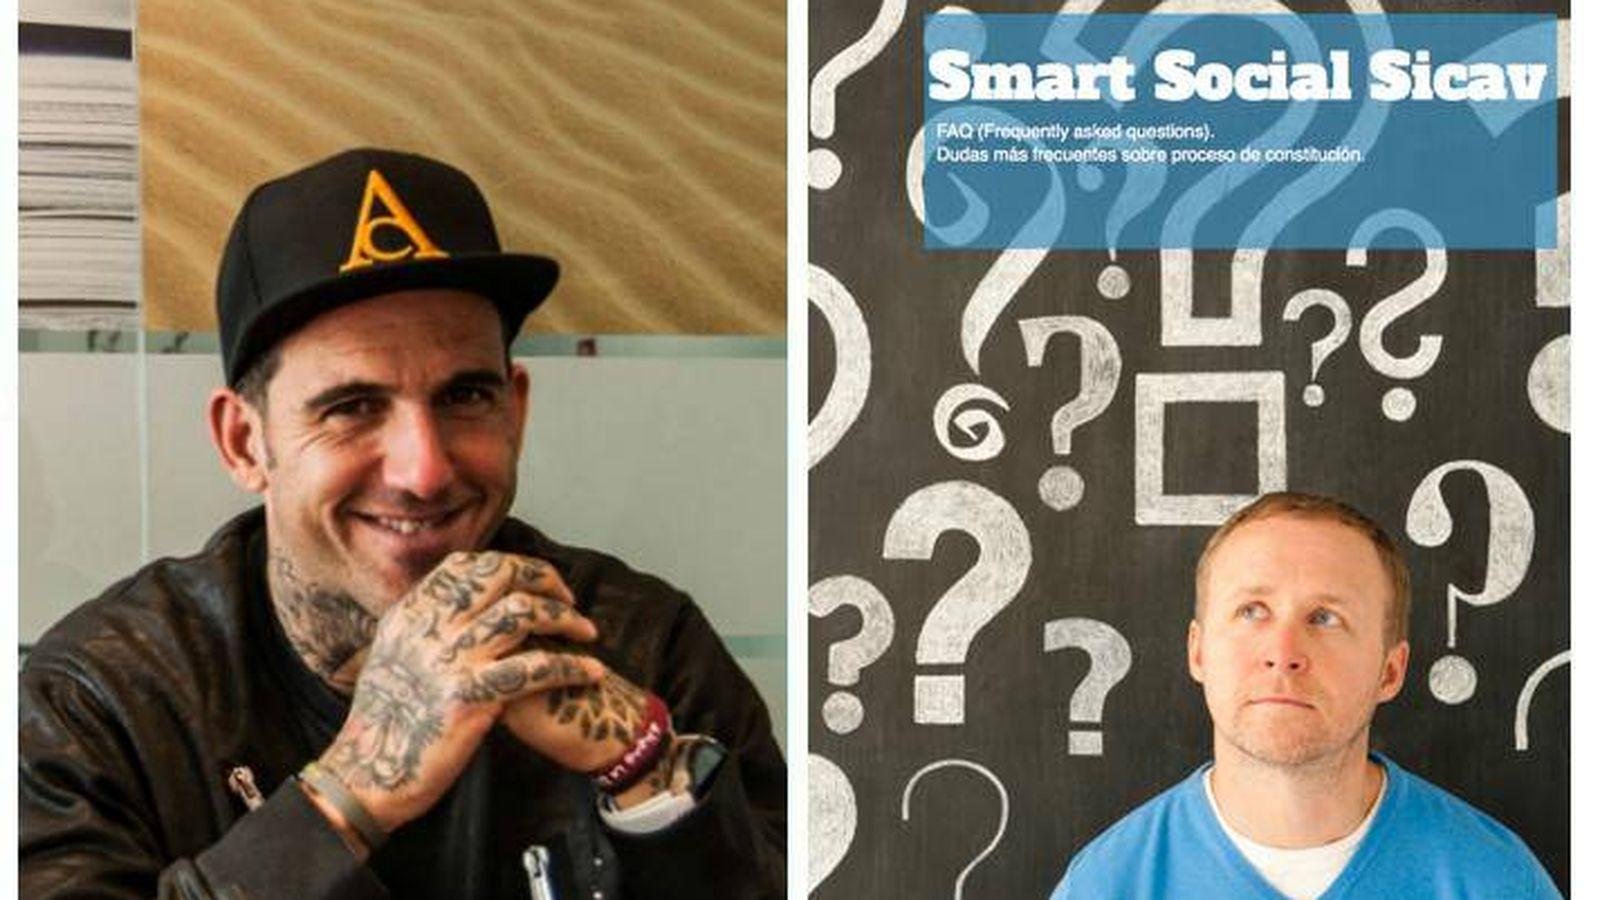 Foto:  ¿Smart Social Sicav o la sicav de Josef Ajram?